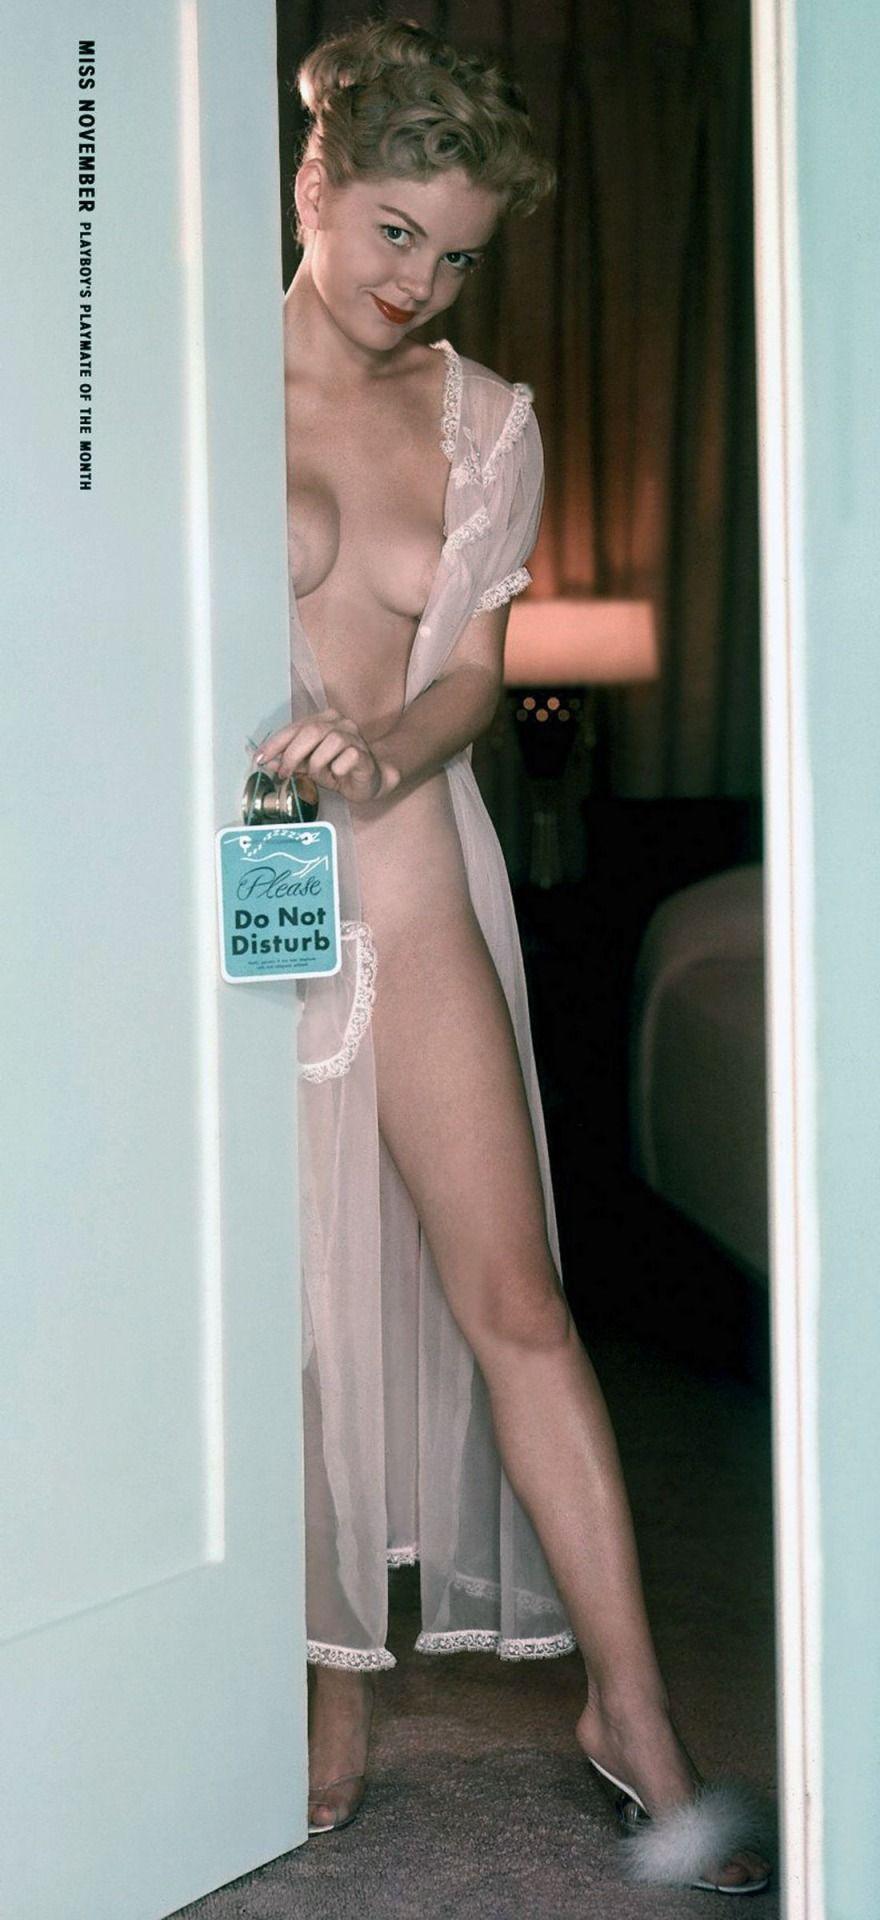 Top model kylie bax porno video